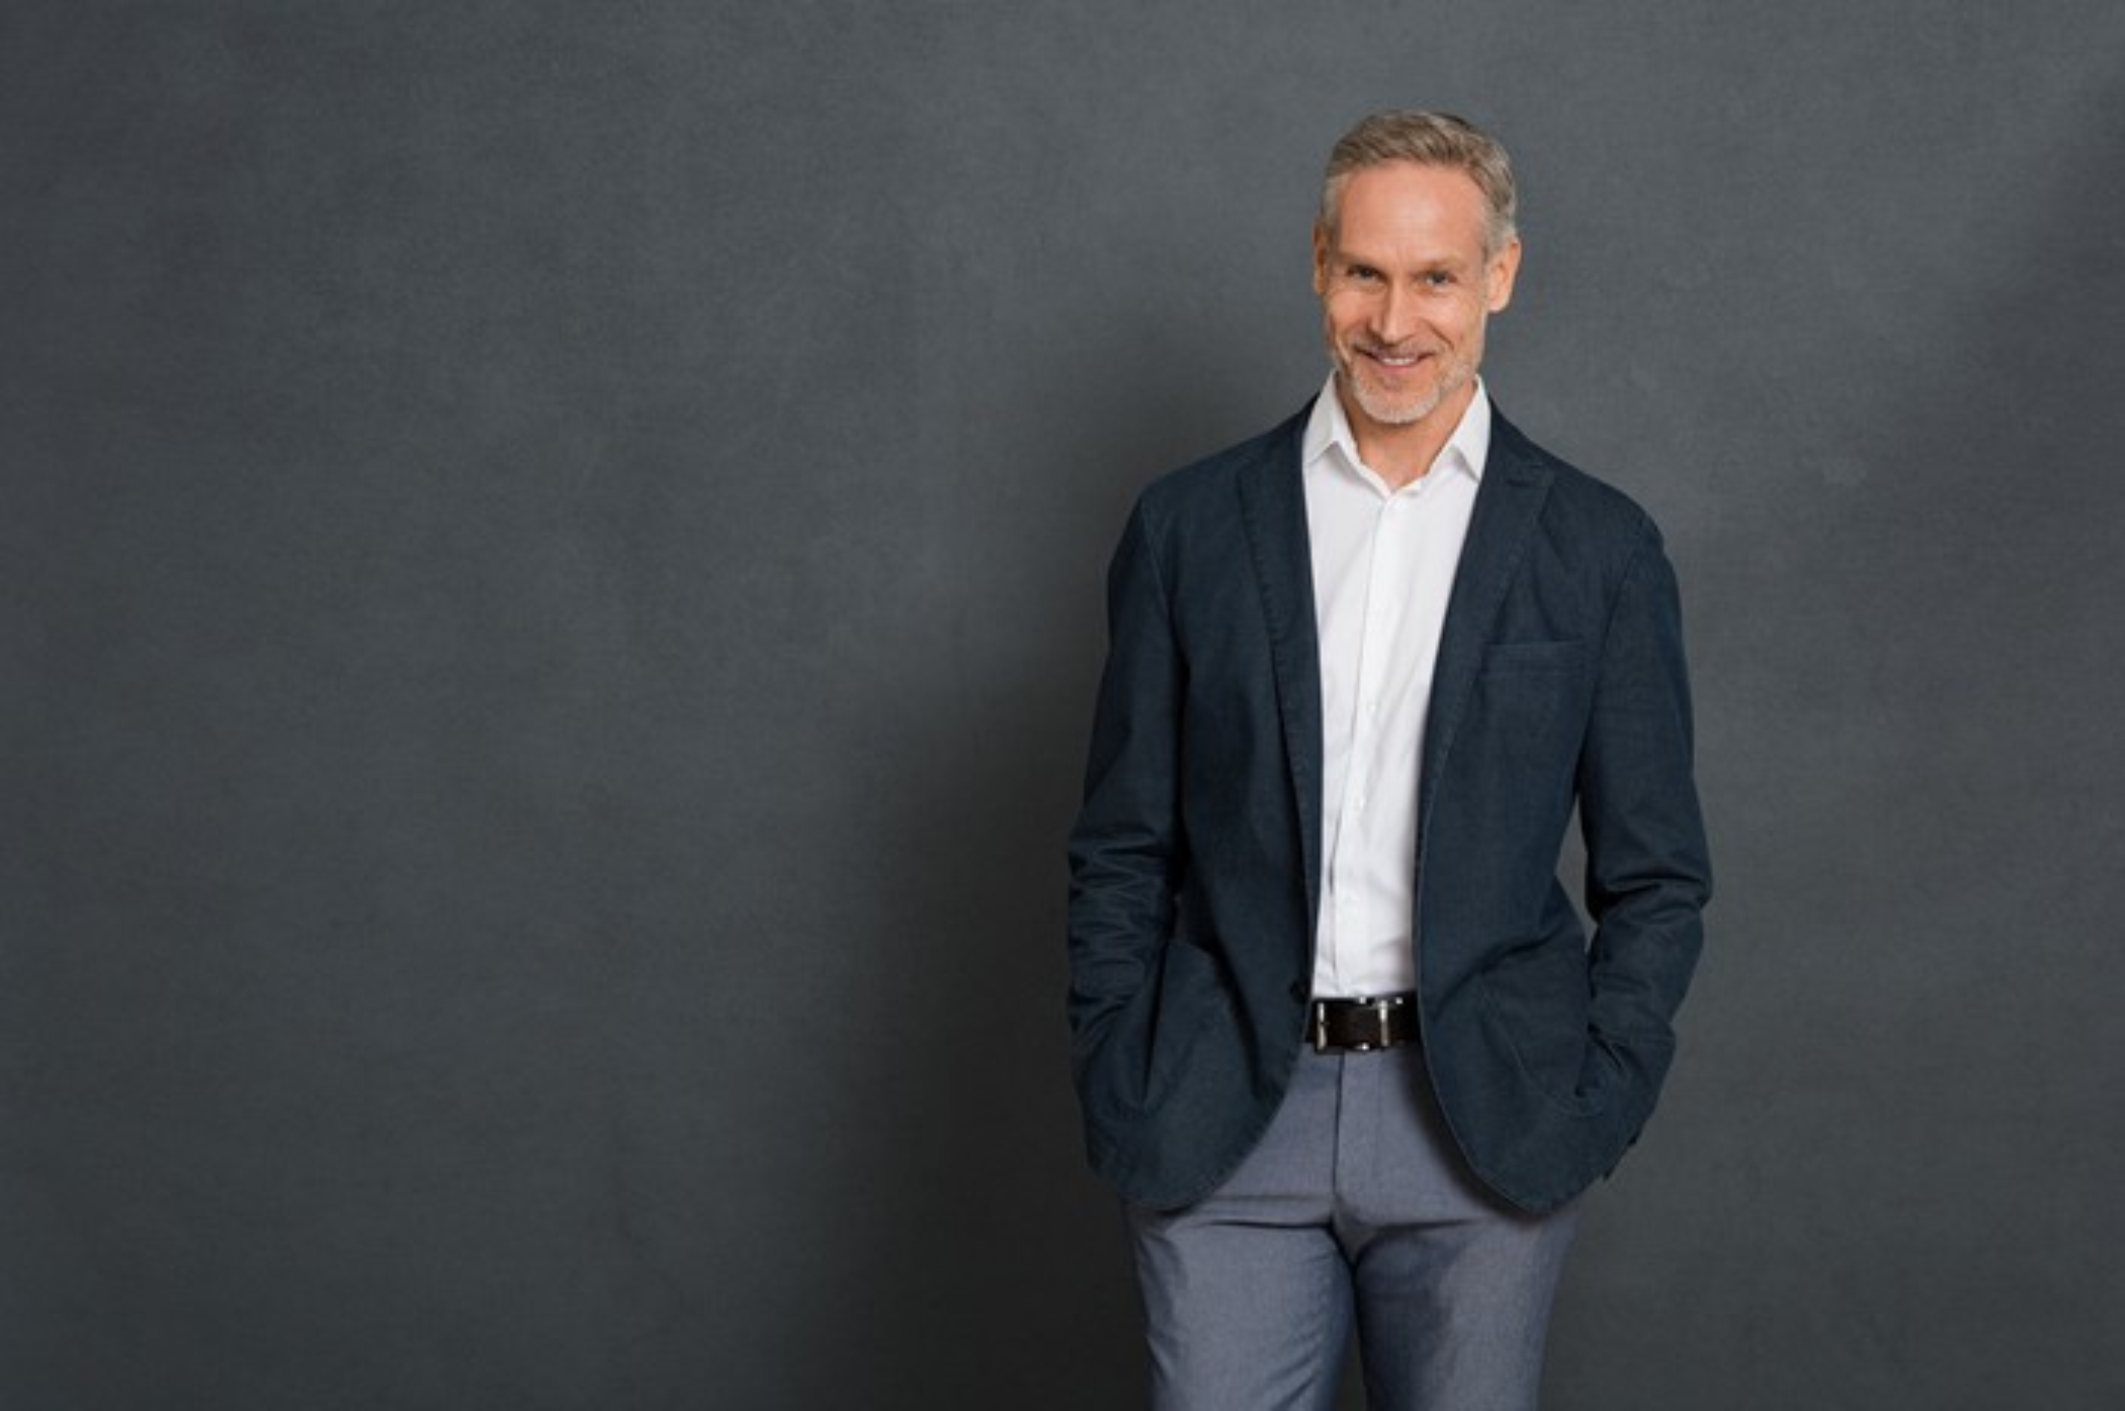 Smiling older man against blackish-gray background